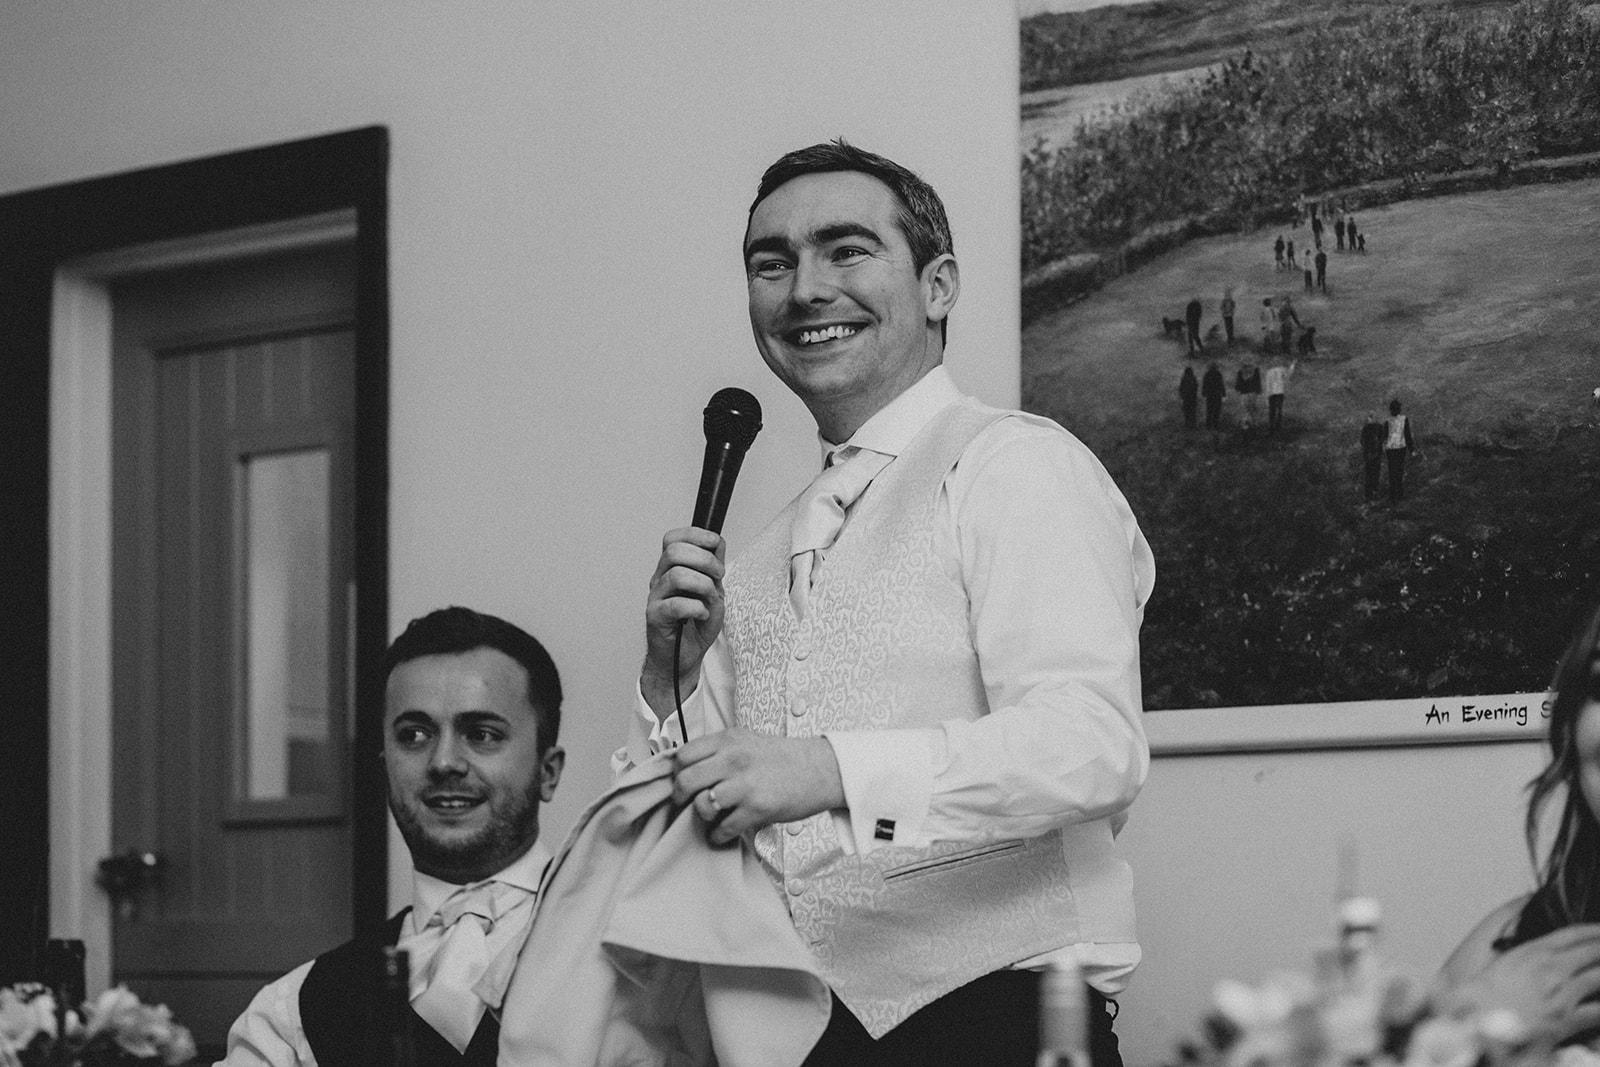 rutland wedding - fun wedding - east midlands wedding planner - Leicestershire wedding planning - nottingham wedding planning - best mans speech